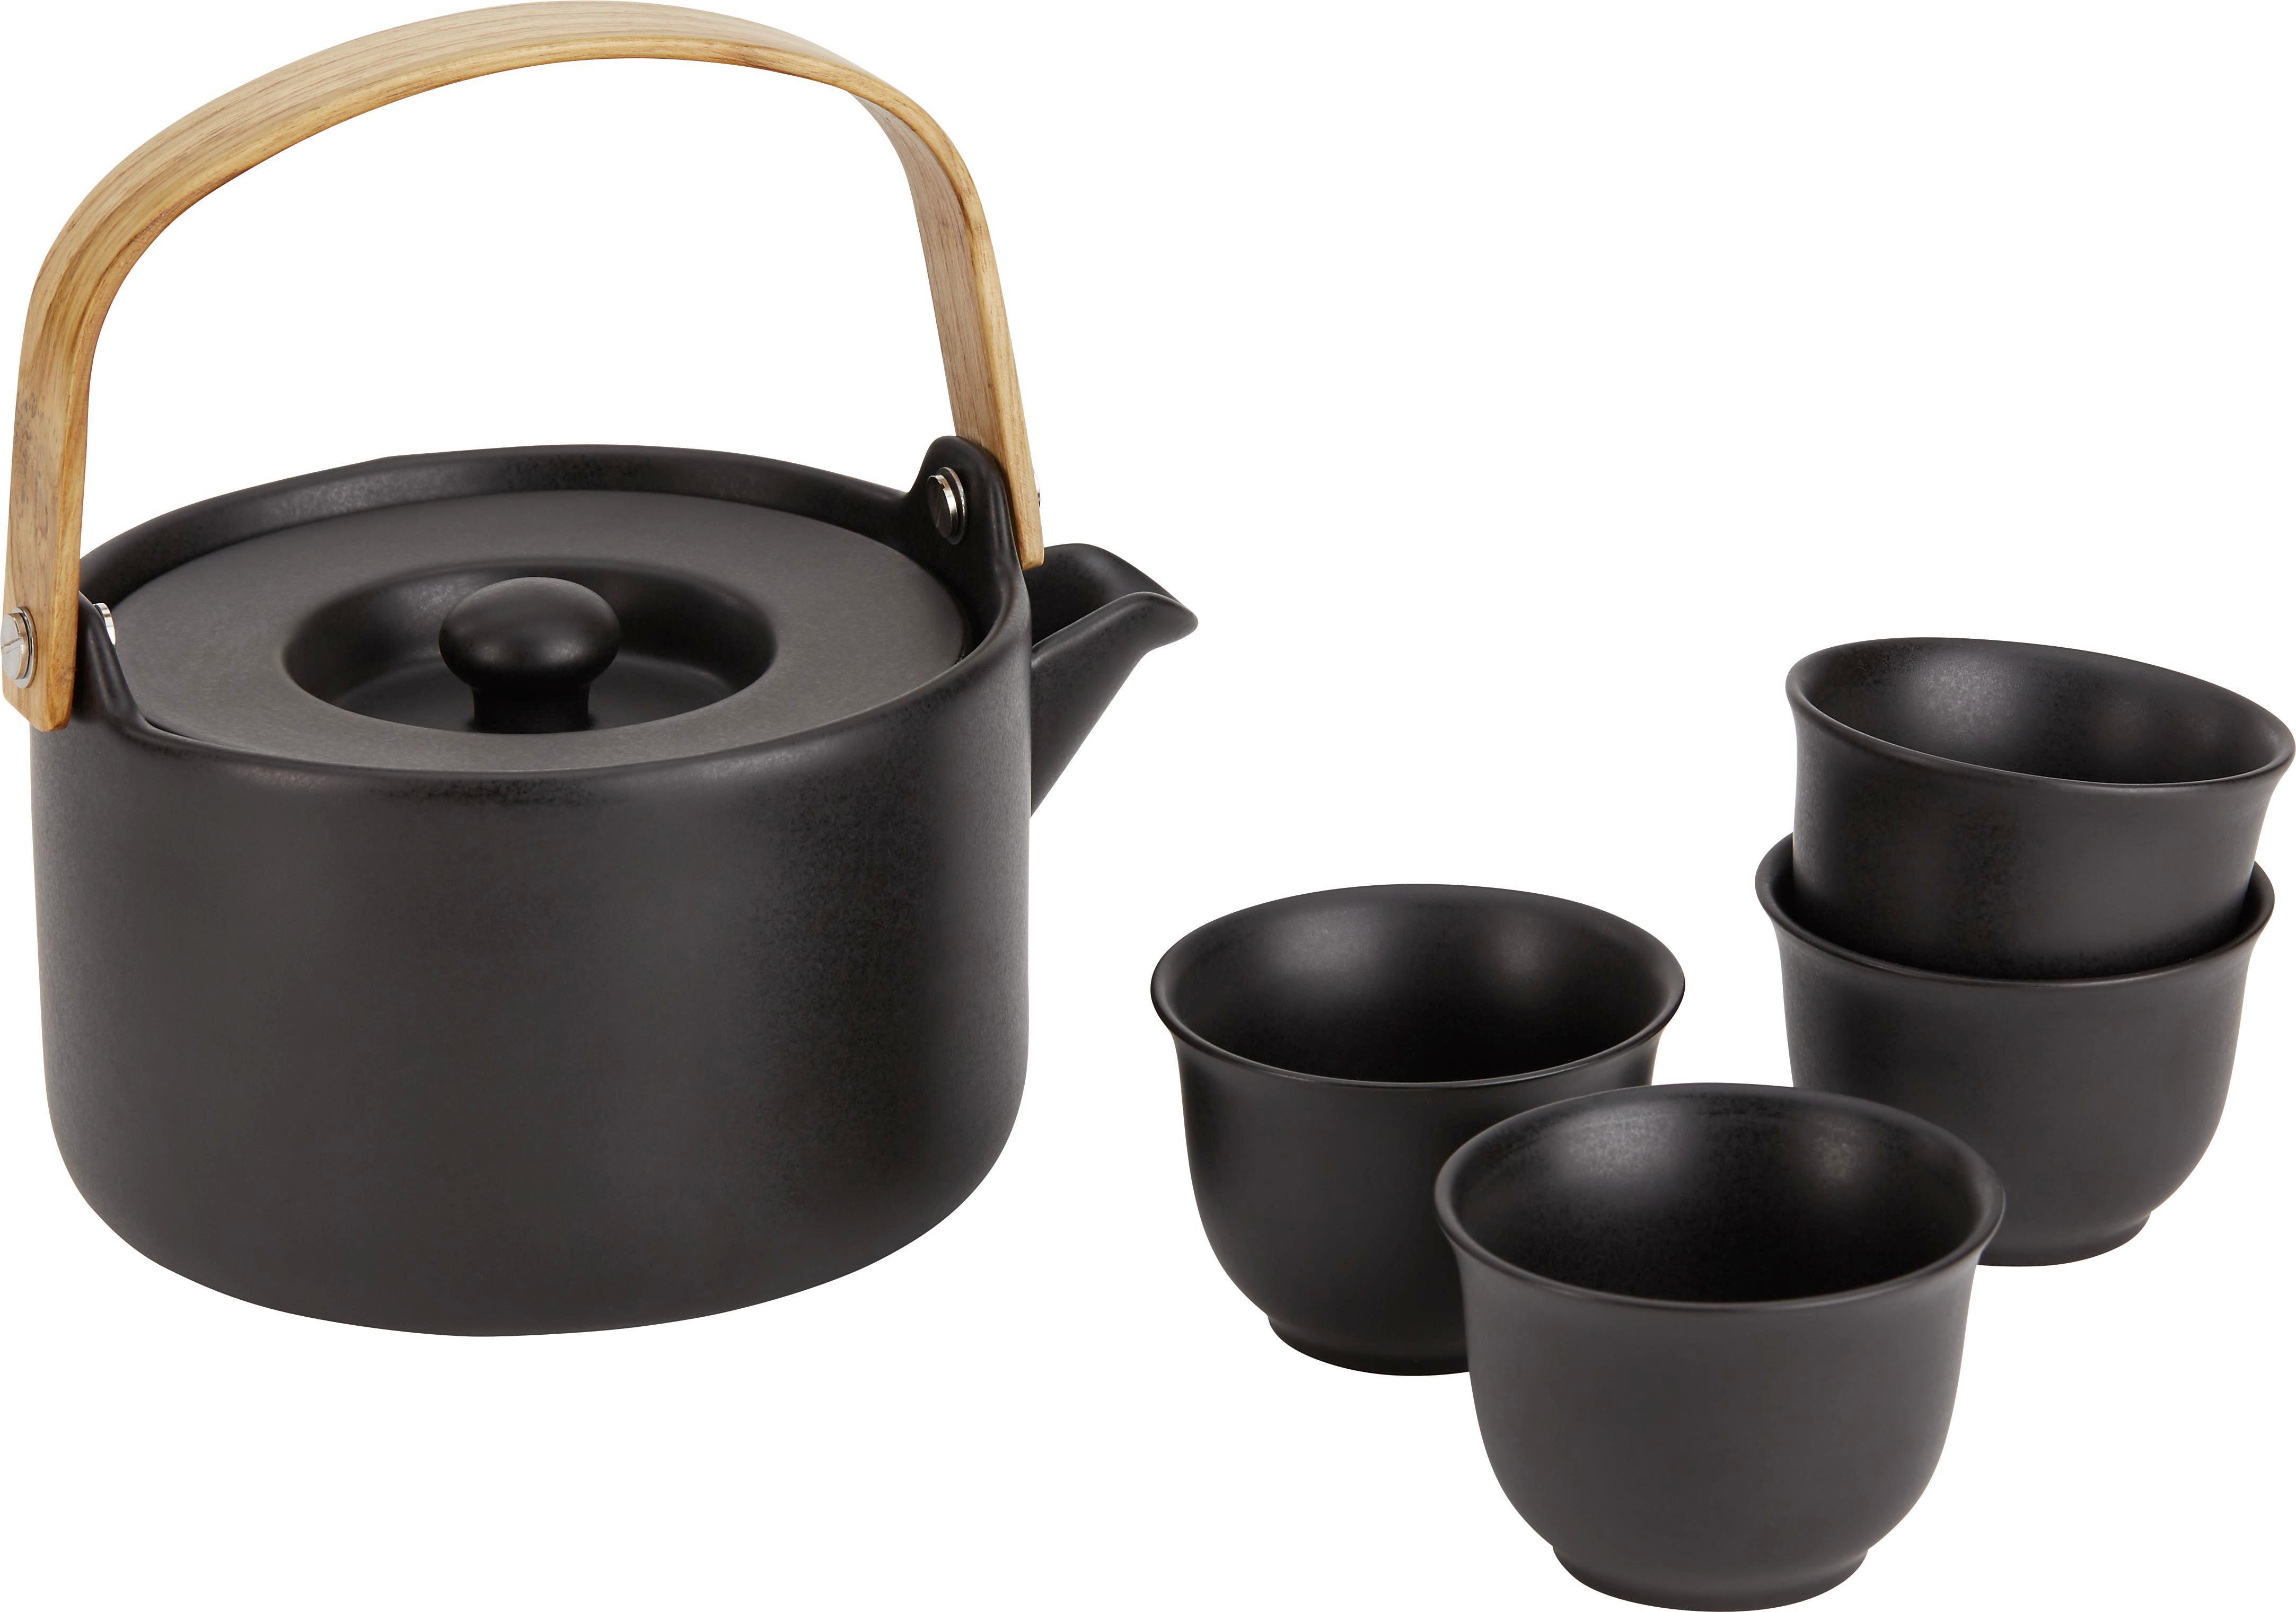 Teeset Ursi in Schwarz, 4-teilig - Schwarz, MODERN, Keramik - premium living